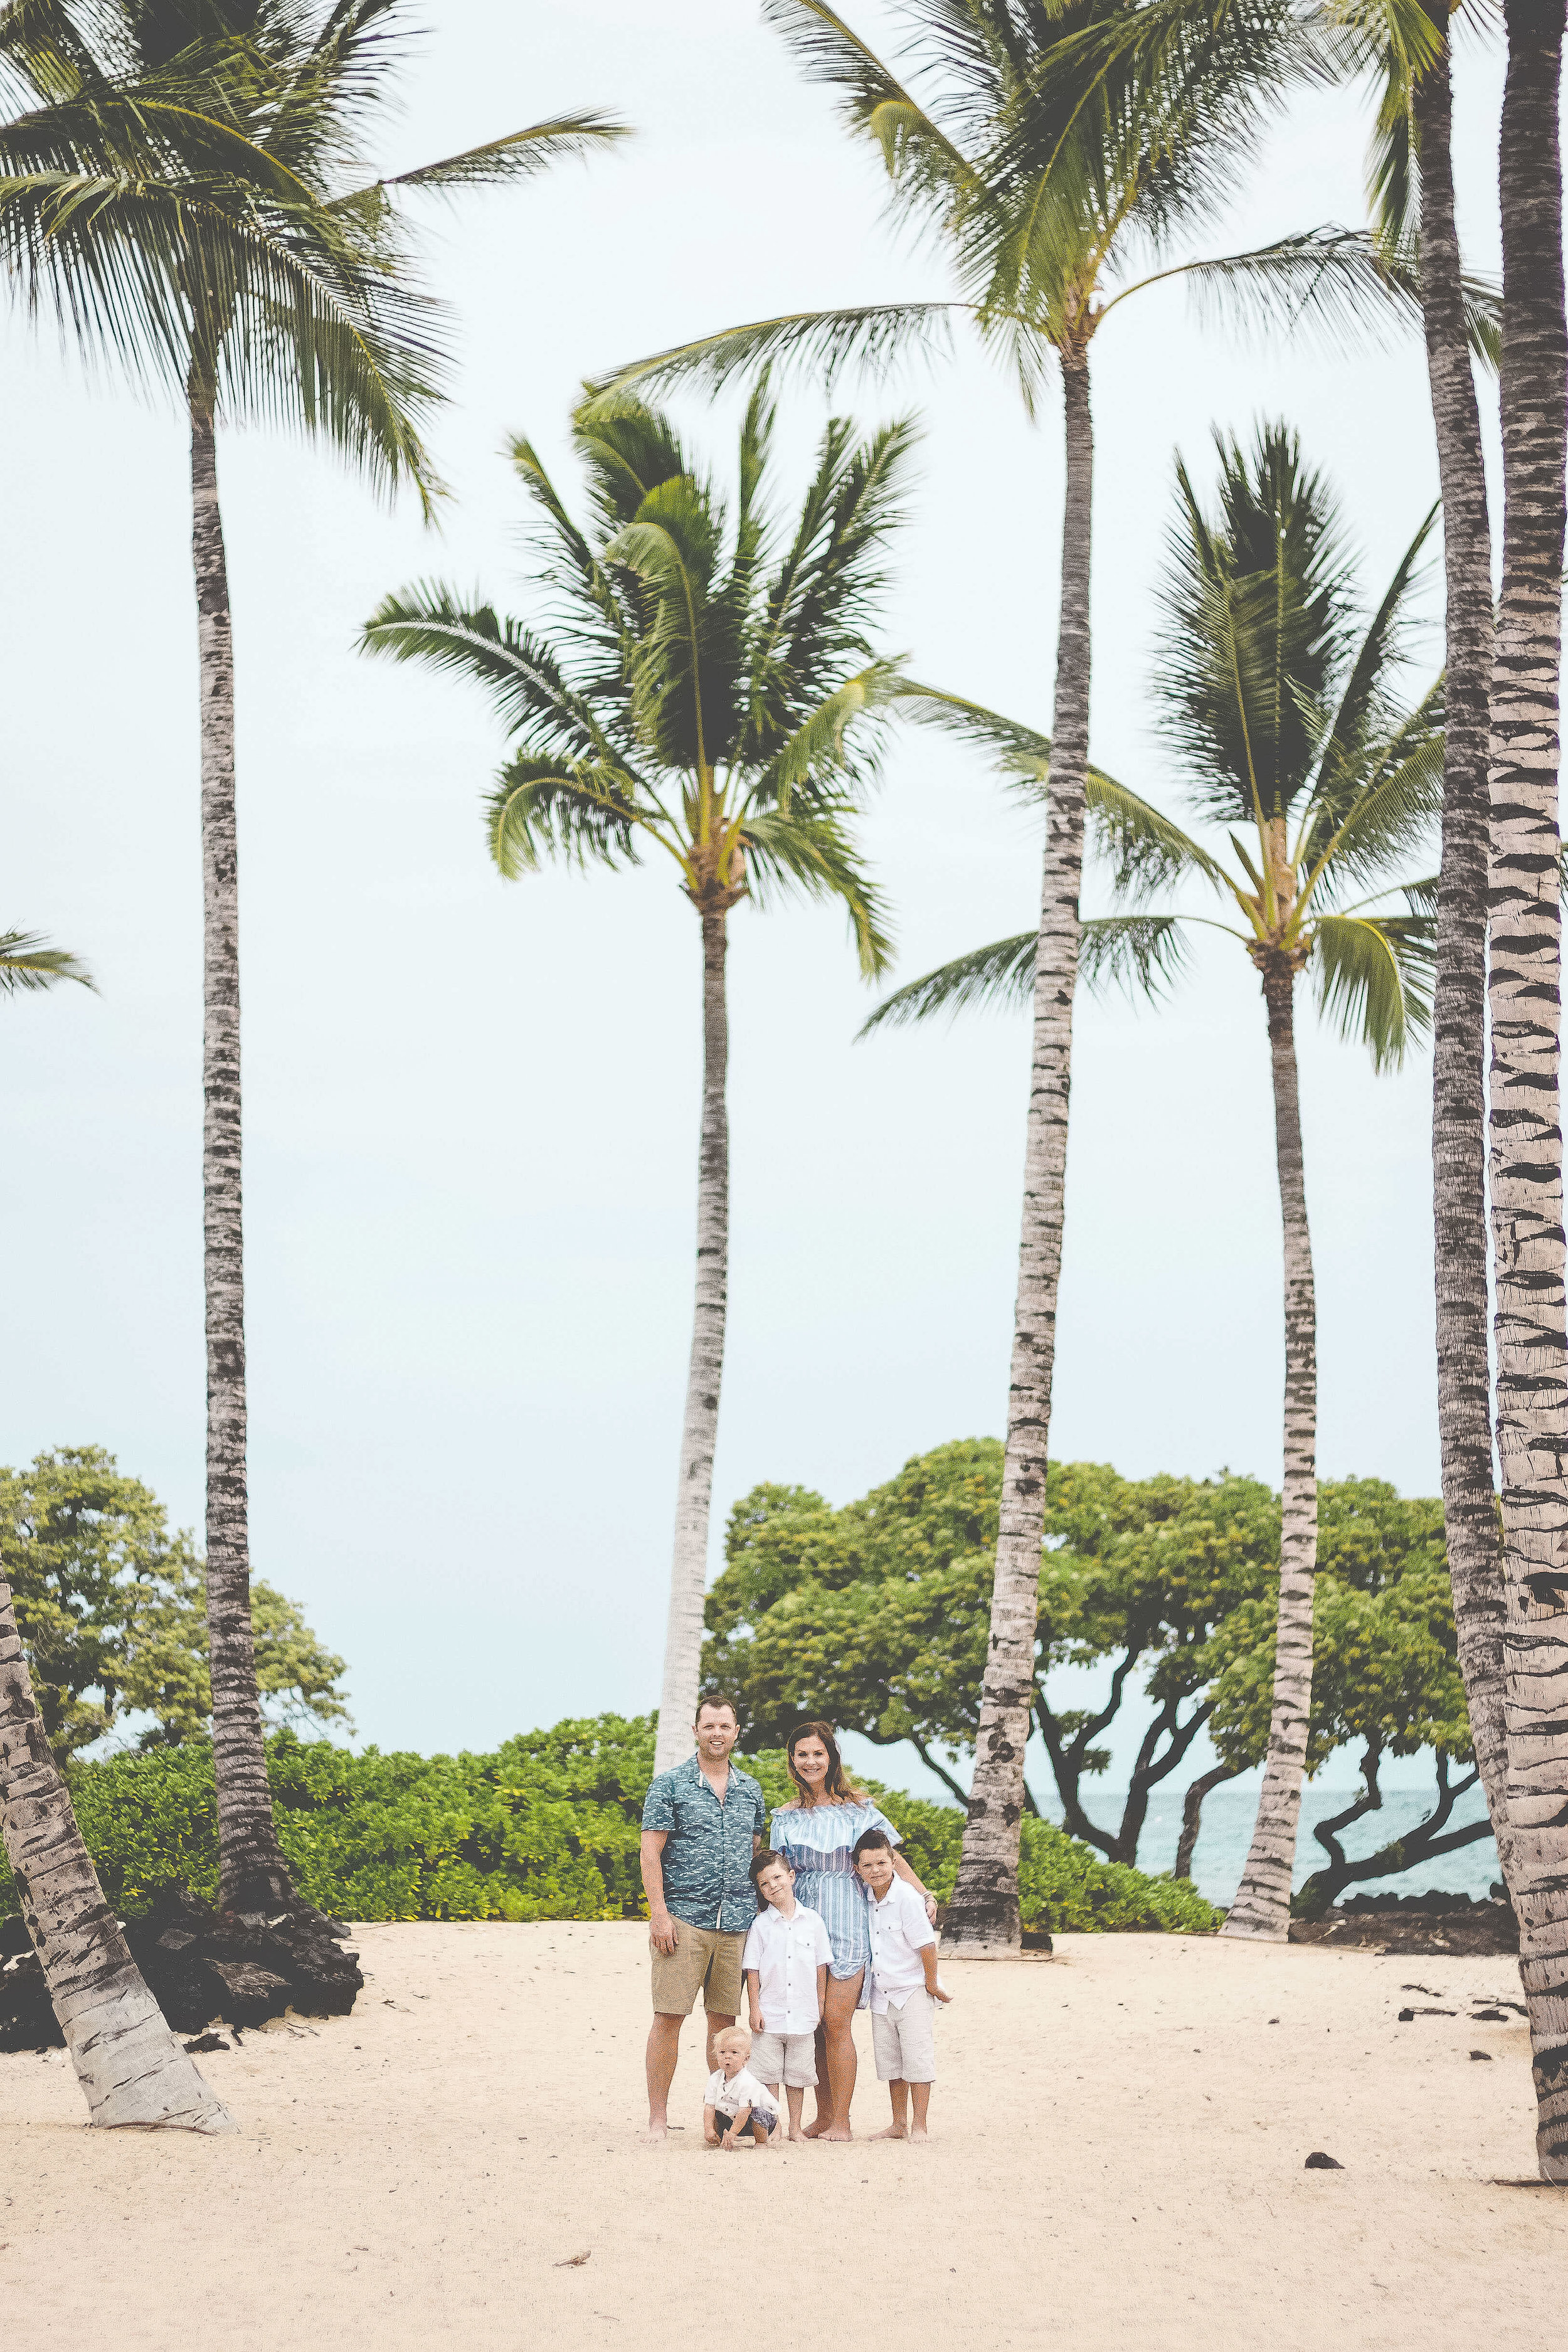 Kona Hawaii family photography photos big island beach and palm trees photographer.jpg